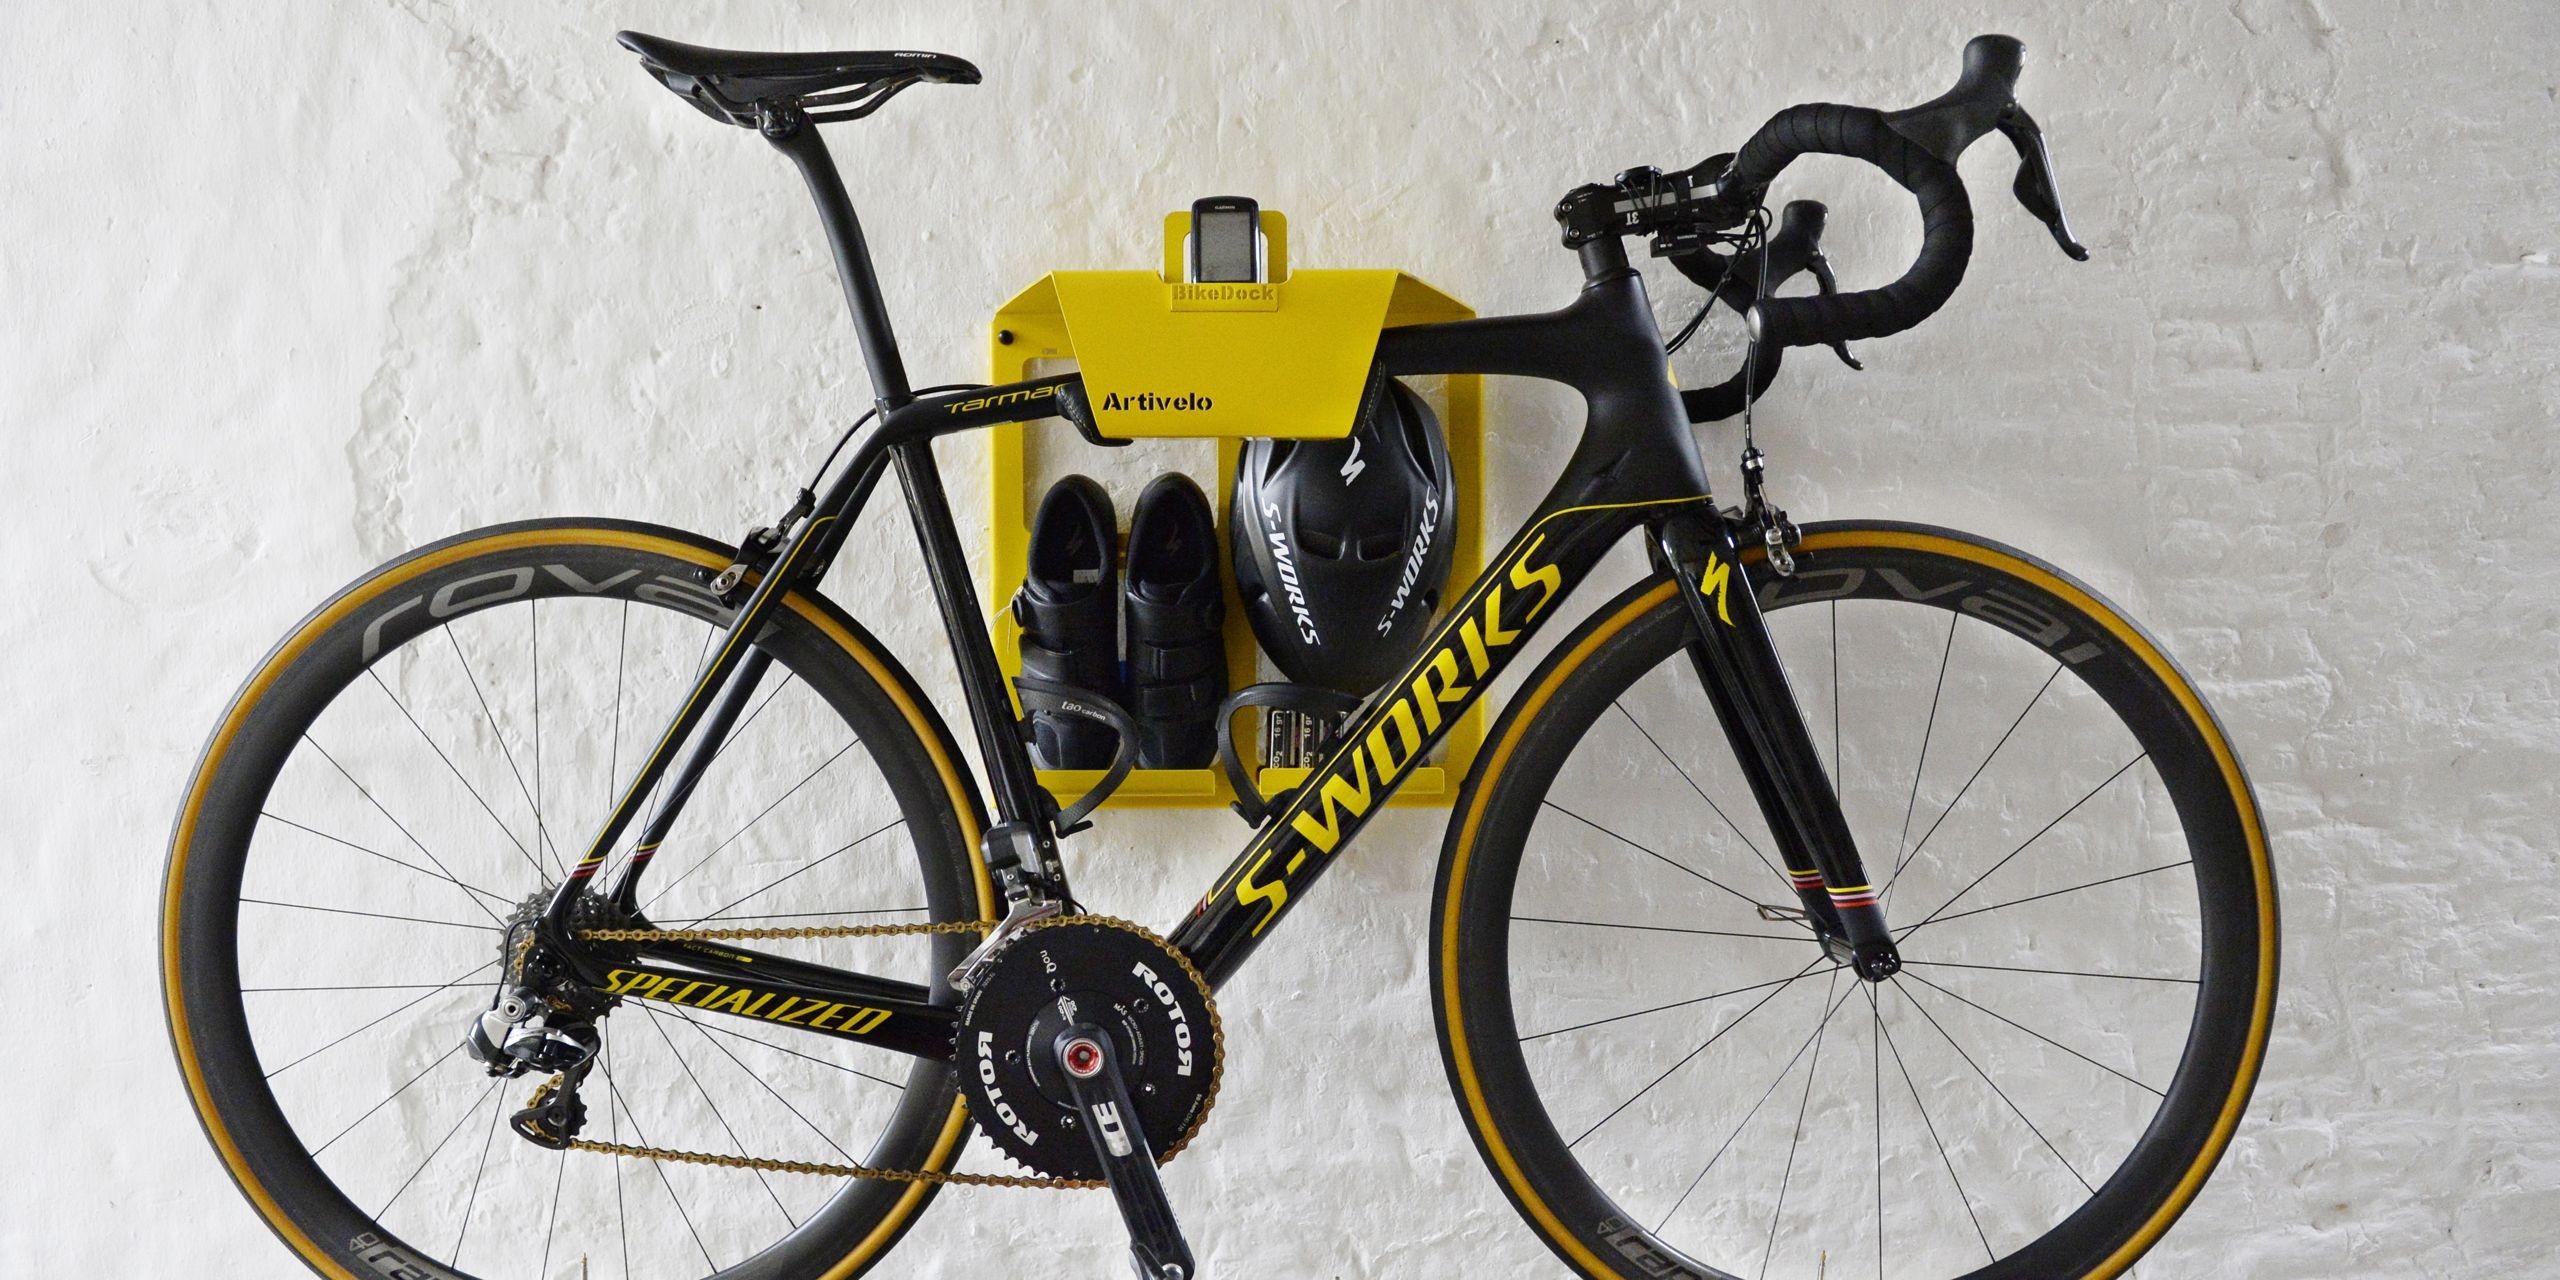 fahrrad wandhalter bikedock tdf gelb 45 x 37 x 45 cm max. Black Bedroom Furniture Sets. Home Design Ideas